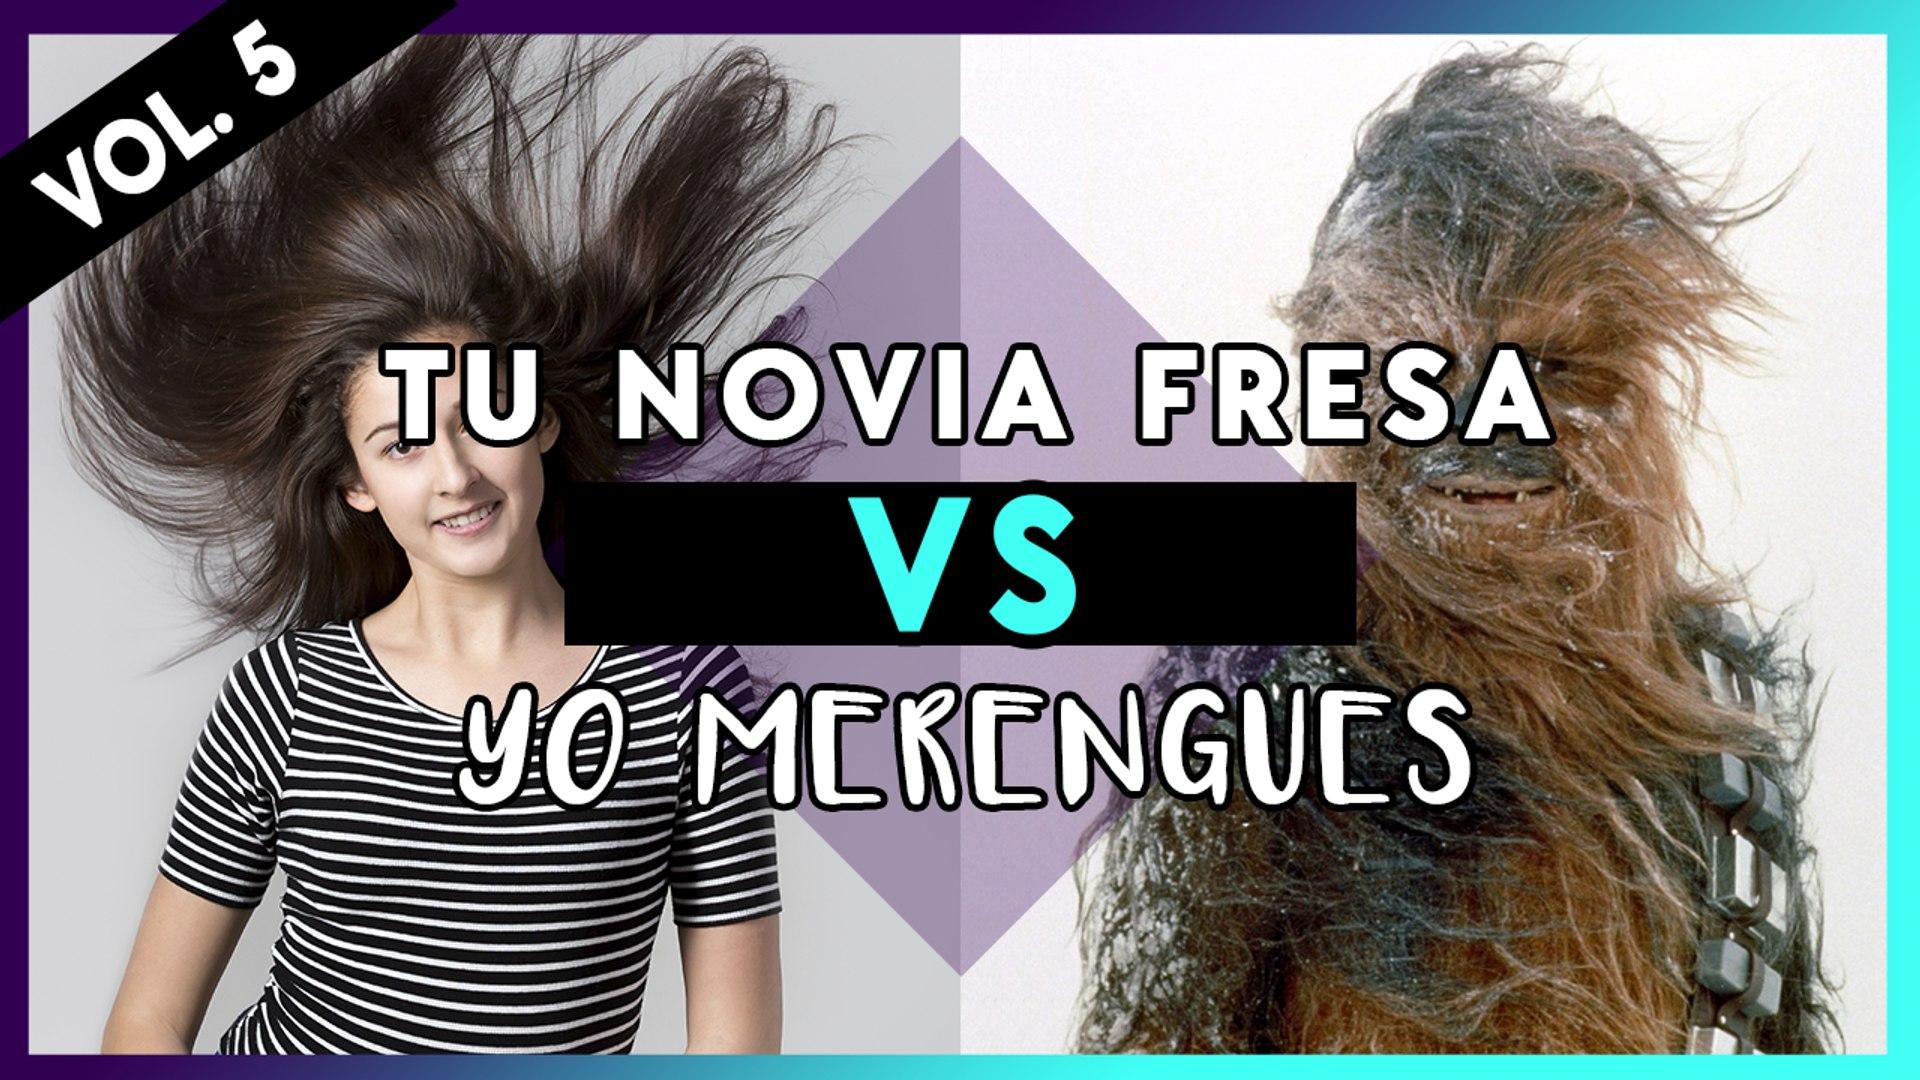 Tu novia la FRESA vs. YO MERENGUES ;) - Vídeo Dailymotion